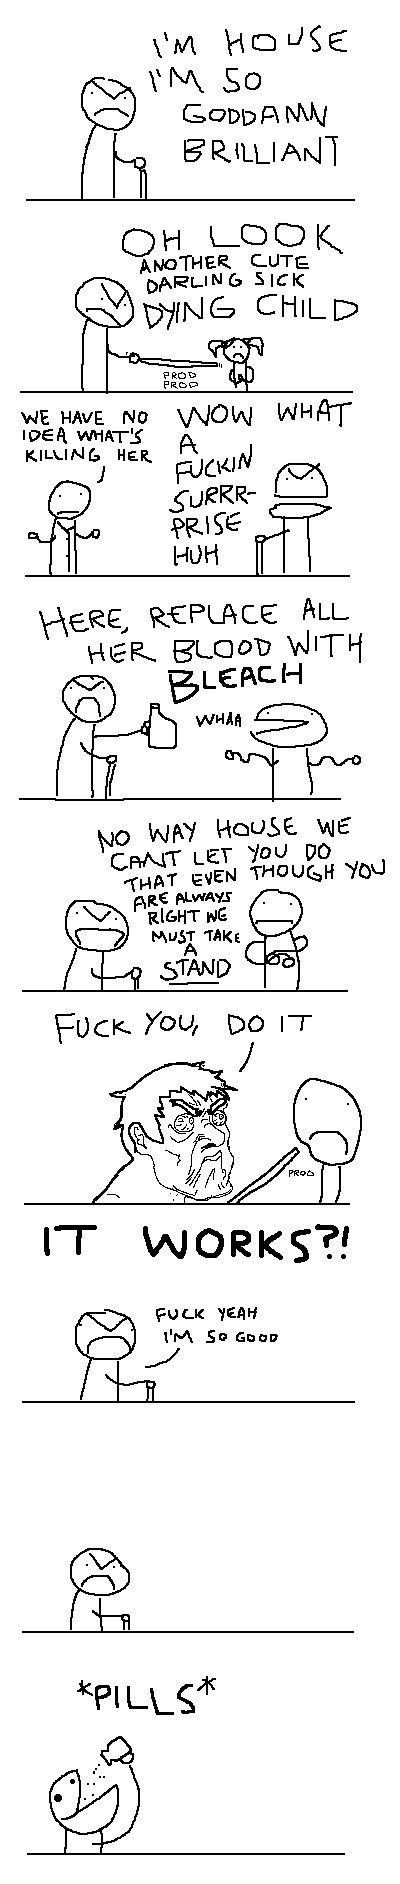 "House Comic. NOT MINE! all credit goes to original creator.. mum No wow NWT IDEA ""MATE A KILLING Halt E, R: EFFACE ELL. ET 'You) Ar HEIGHT NE (rij) MUS; TAKE di"